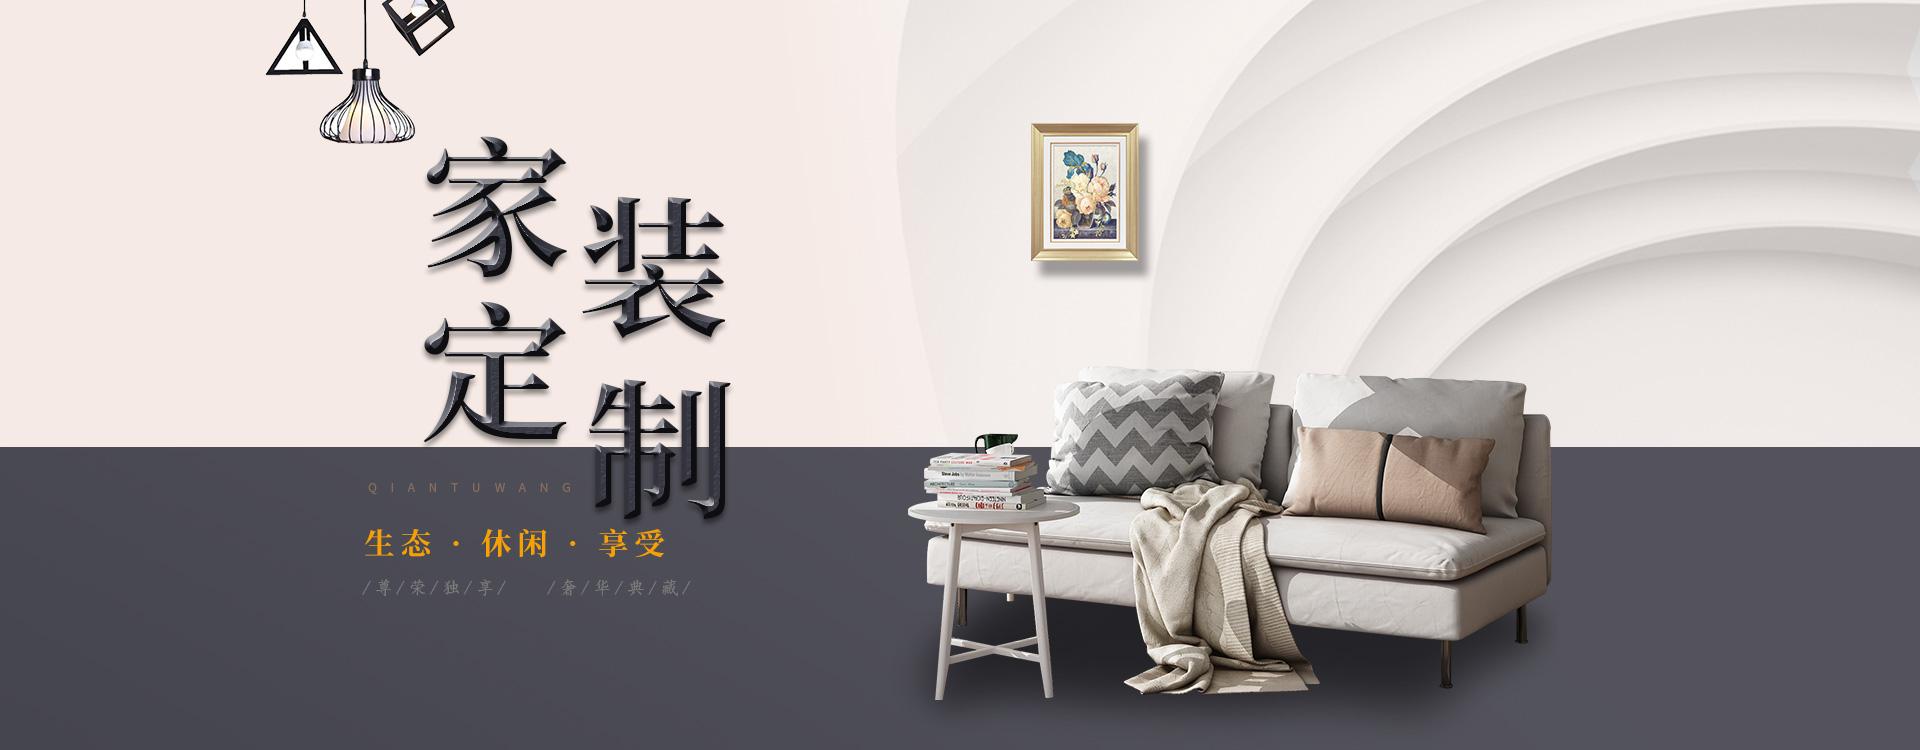 内蒙古开瑞家具